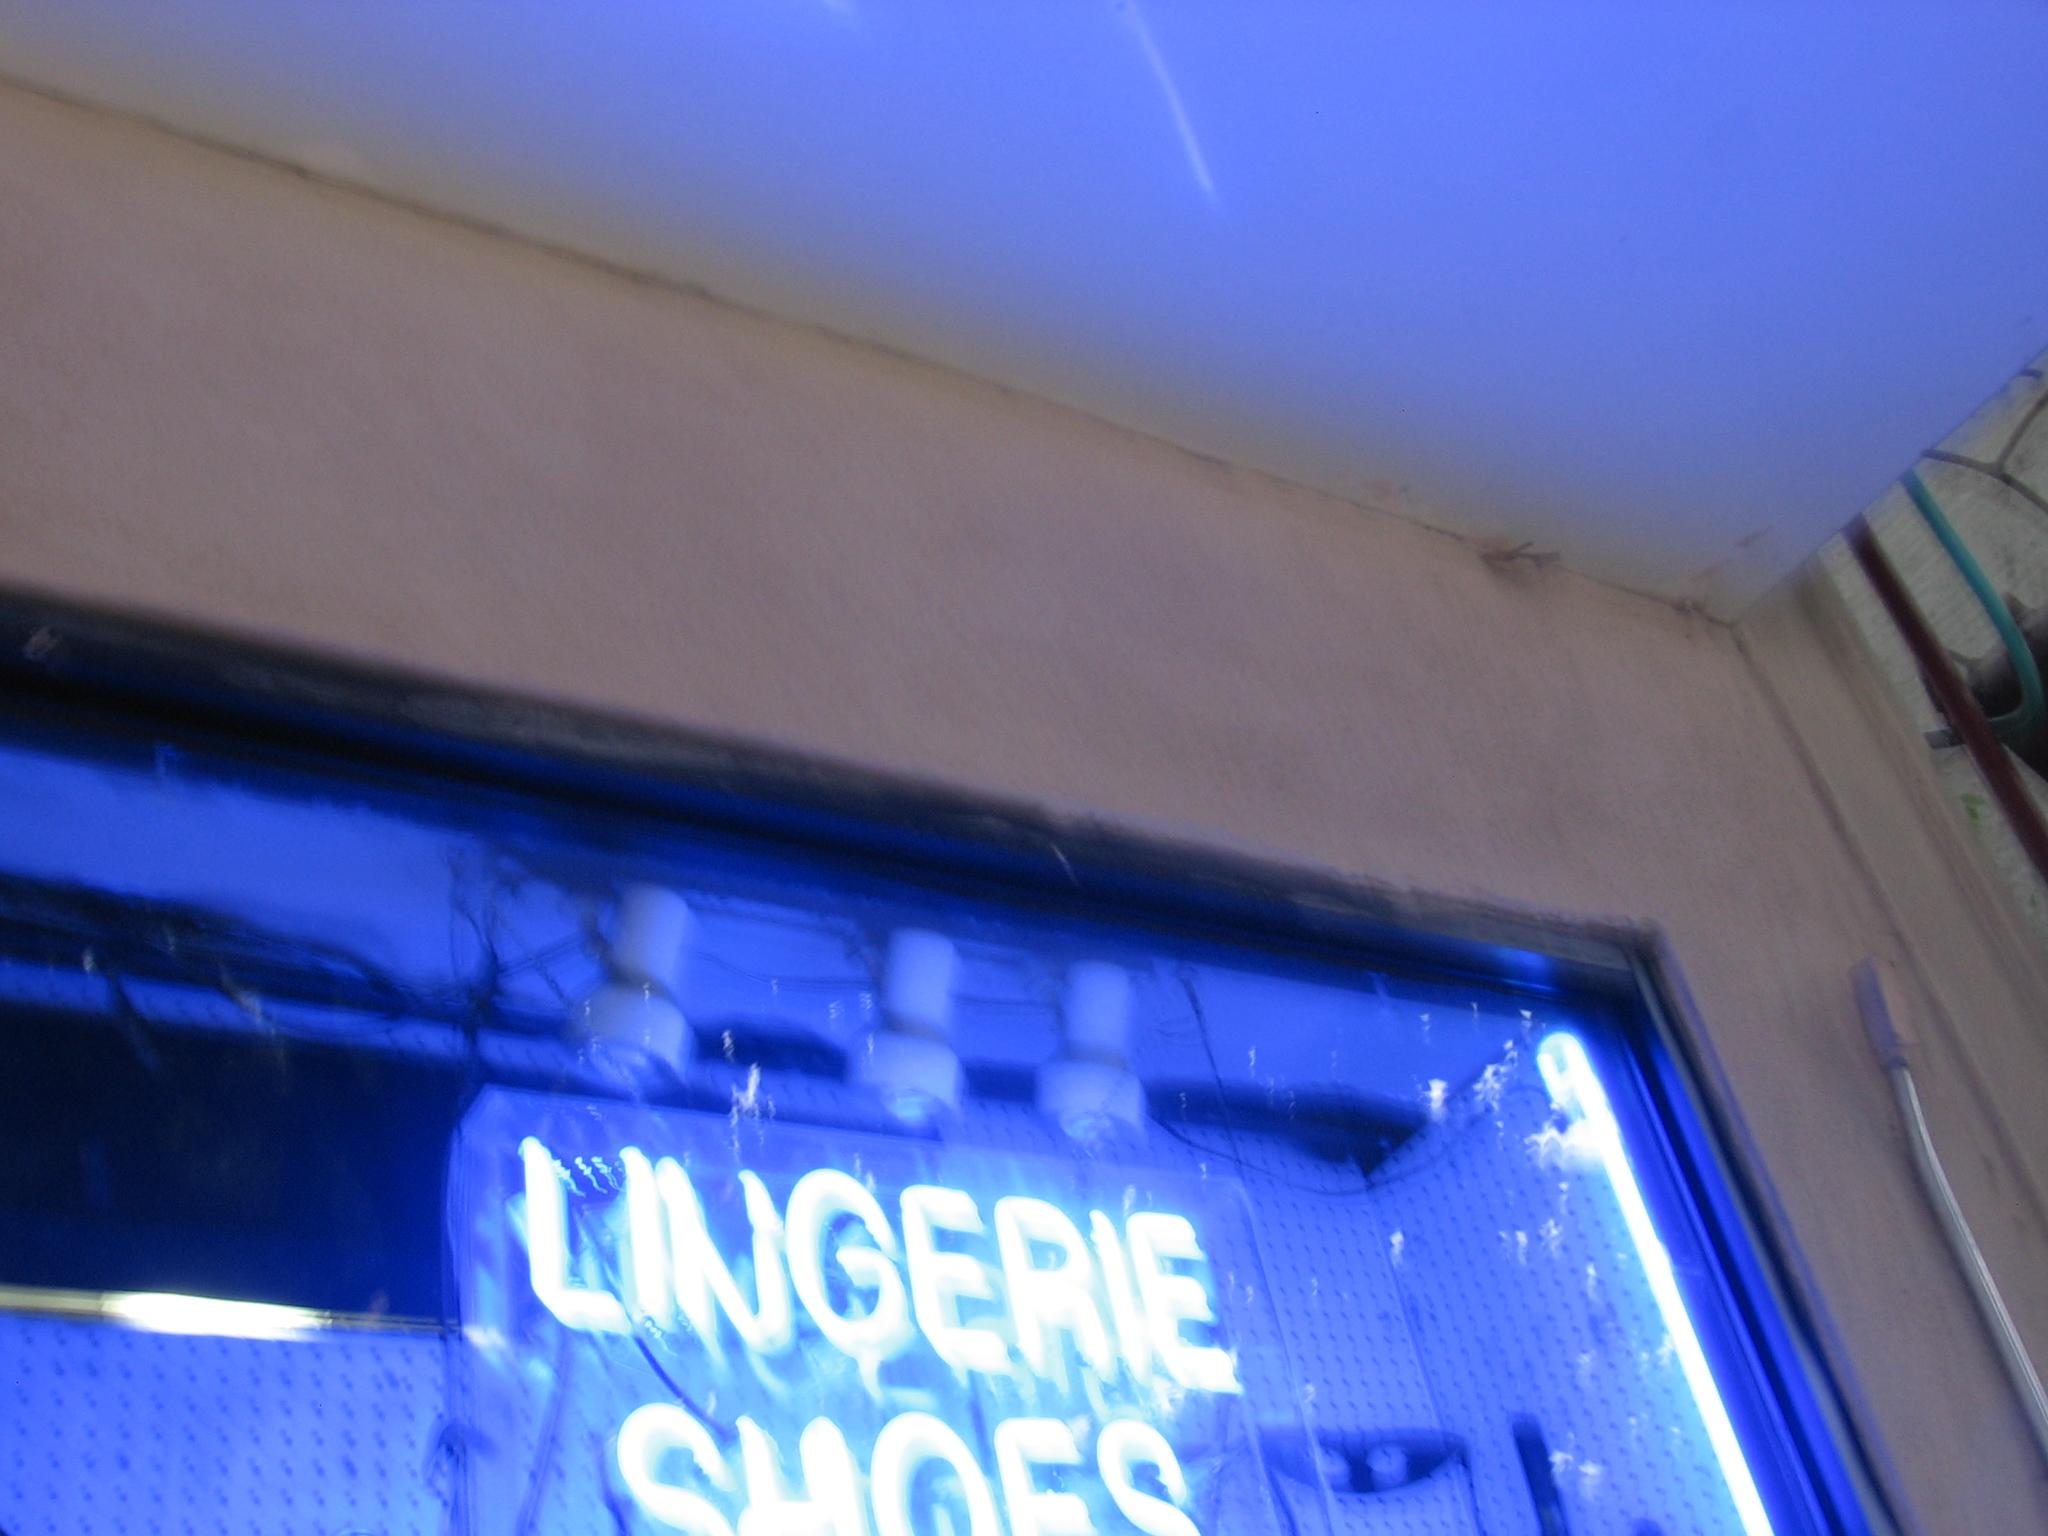 Lingerie-shoes neon sign.JPG